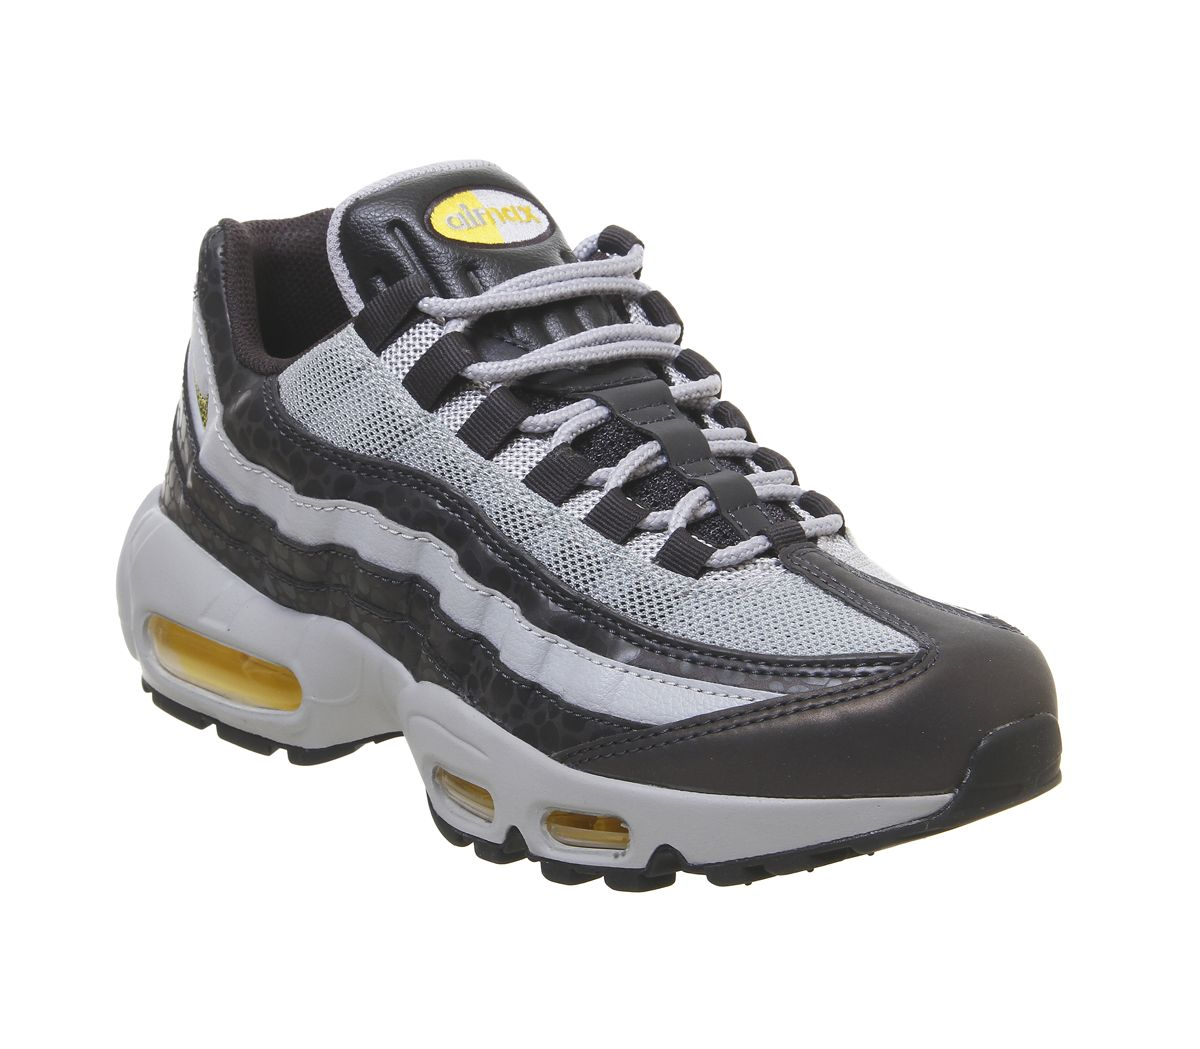 bdea627b076 Nike Air Max 95 Trainers Mekbuda Off Noir Yellow Atmophere Grey ...